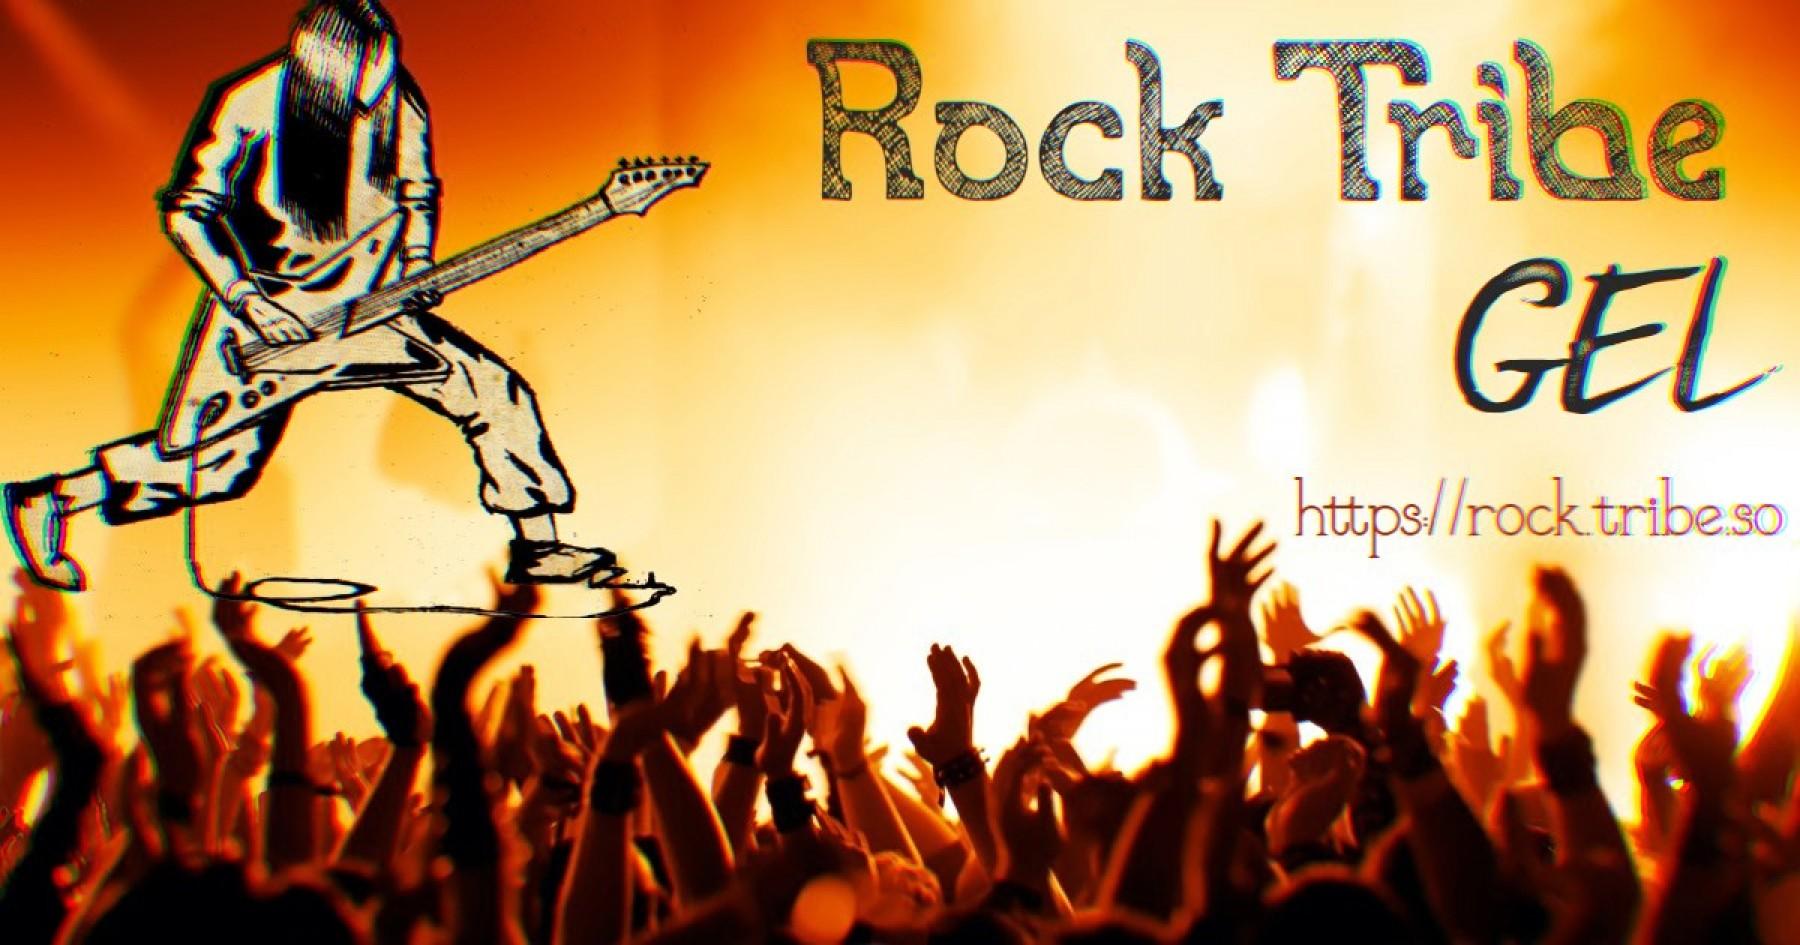 rock tribe kapak fotoğrafı